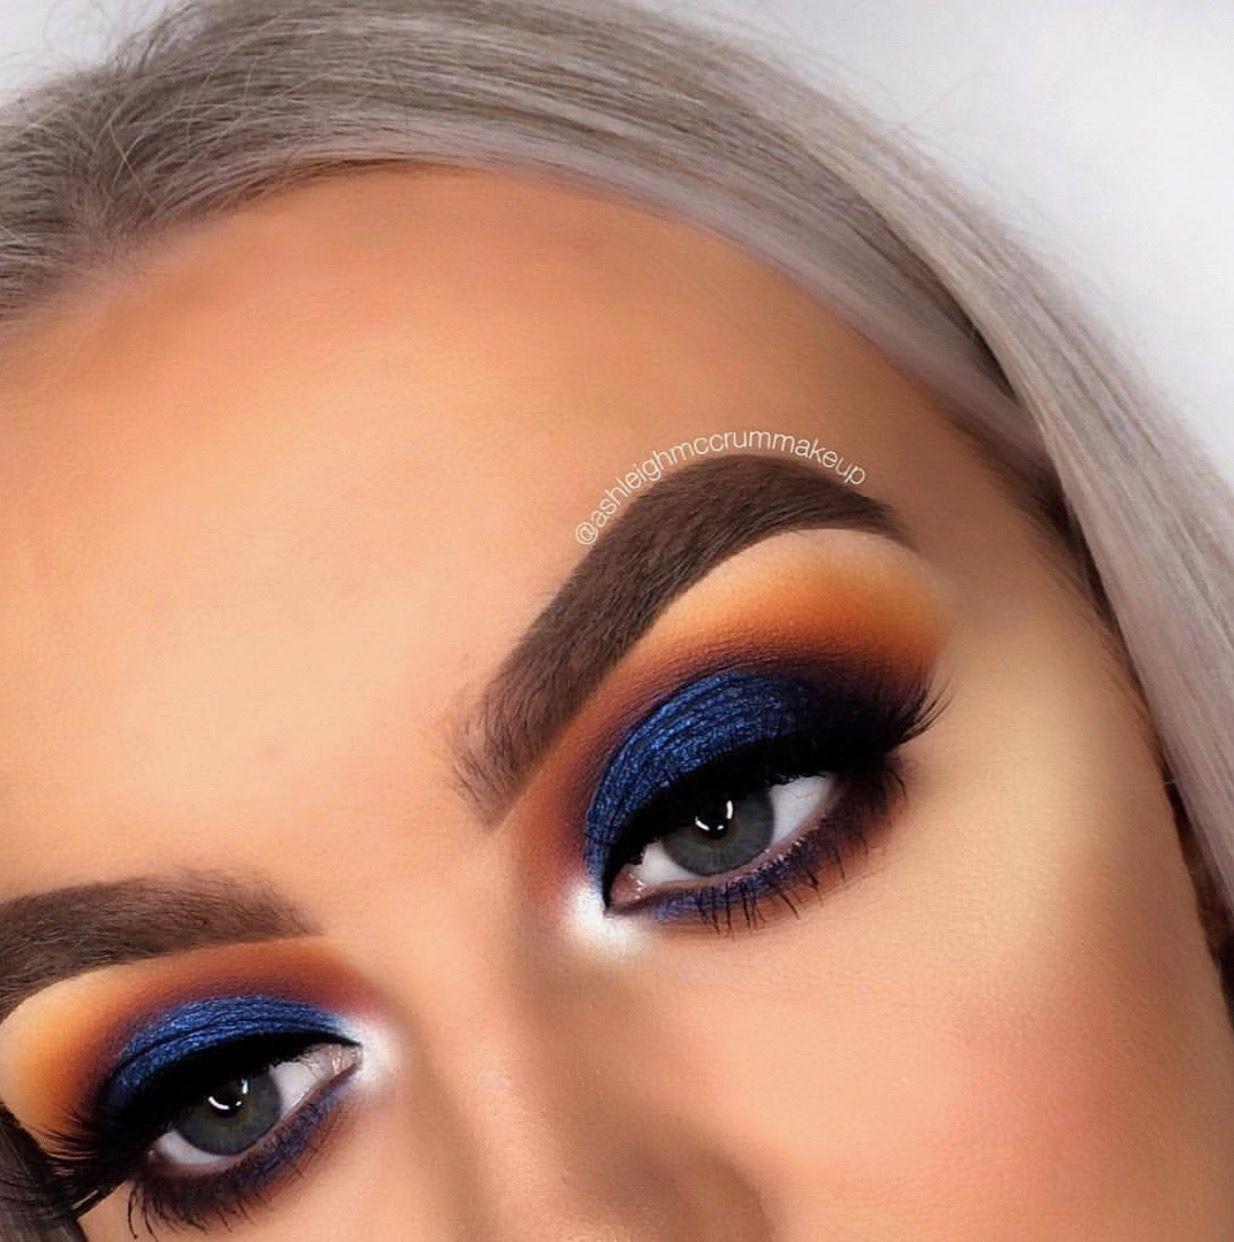 Pin by Sasha Fadeeva on Makeup | Eyes lips face, Makeup